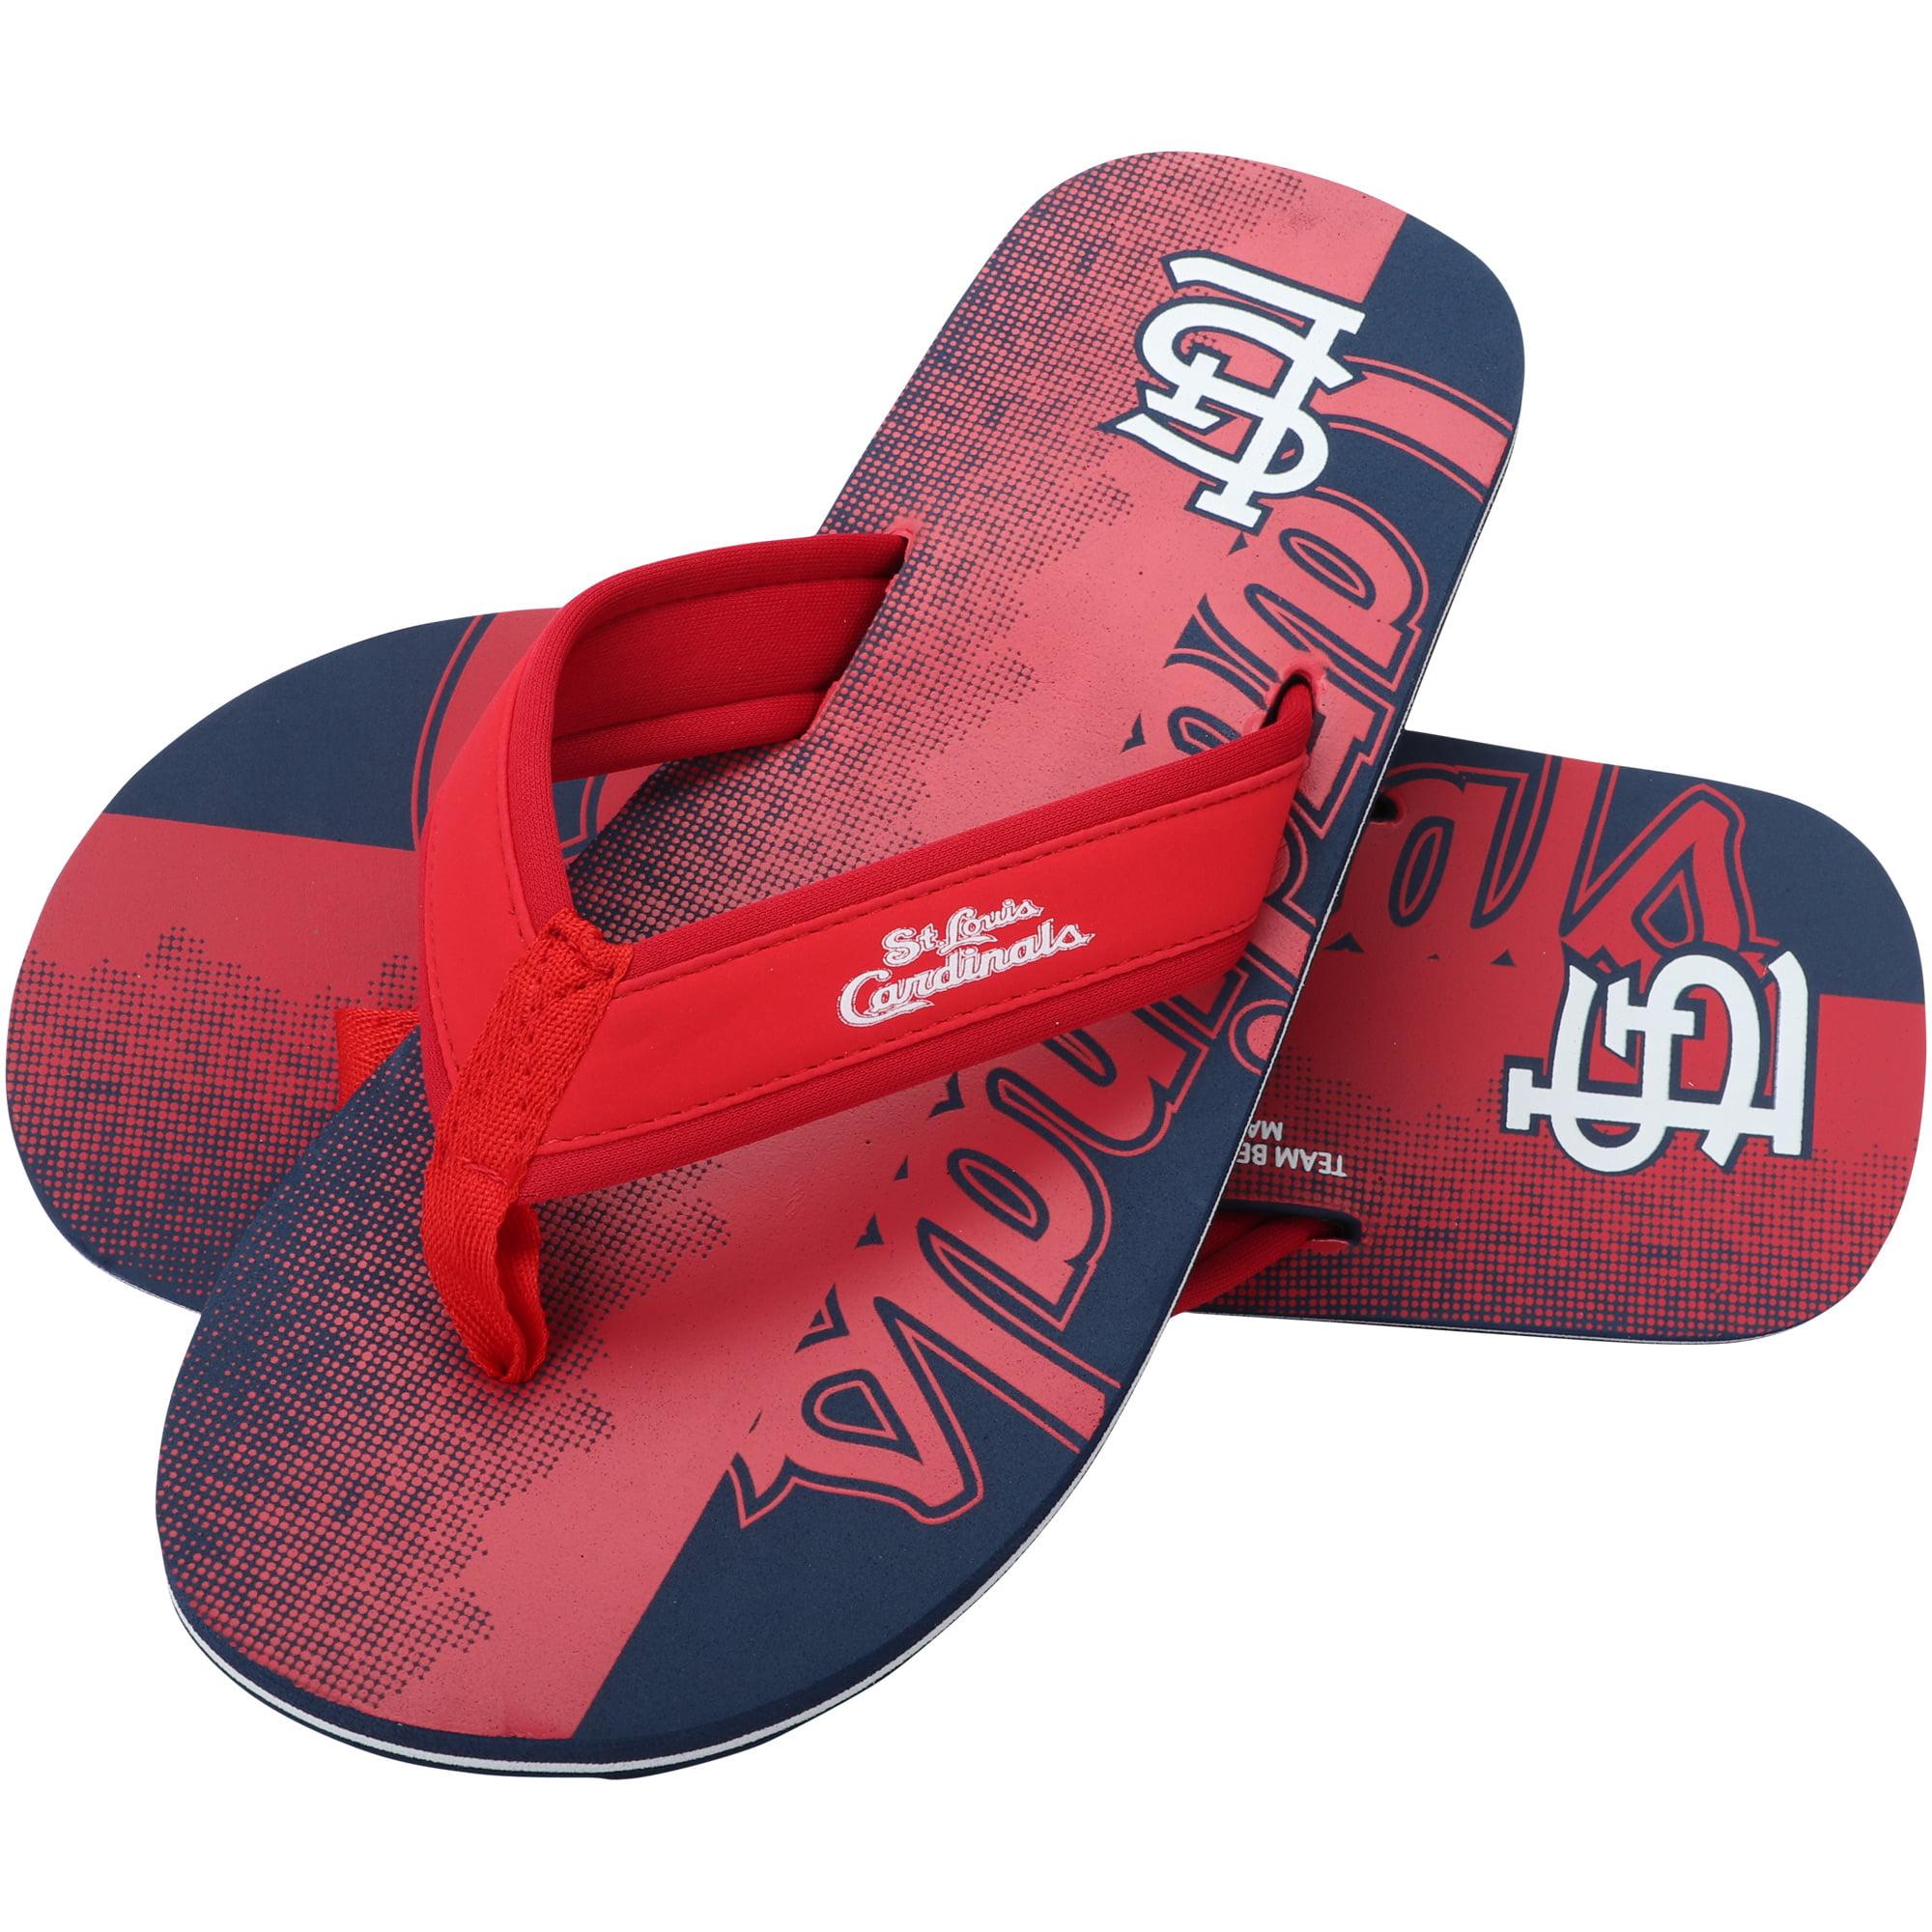 St. Louis Cardinals Contour Fade Wordmark Flip Flops